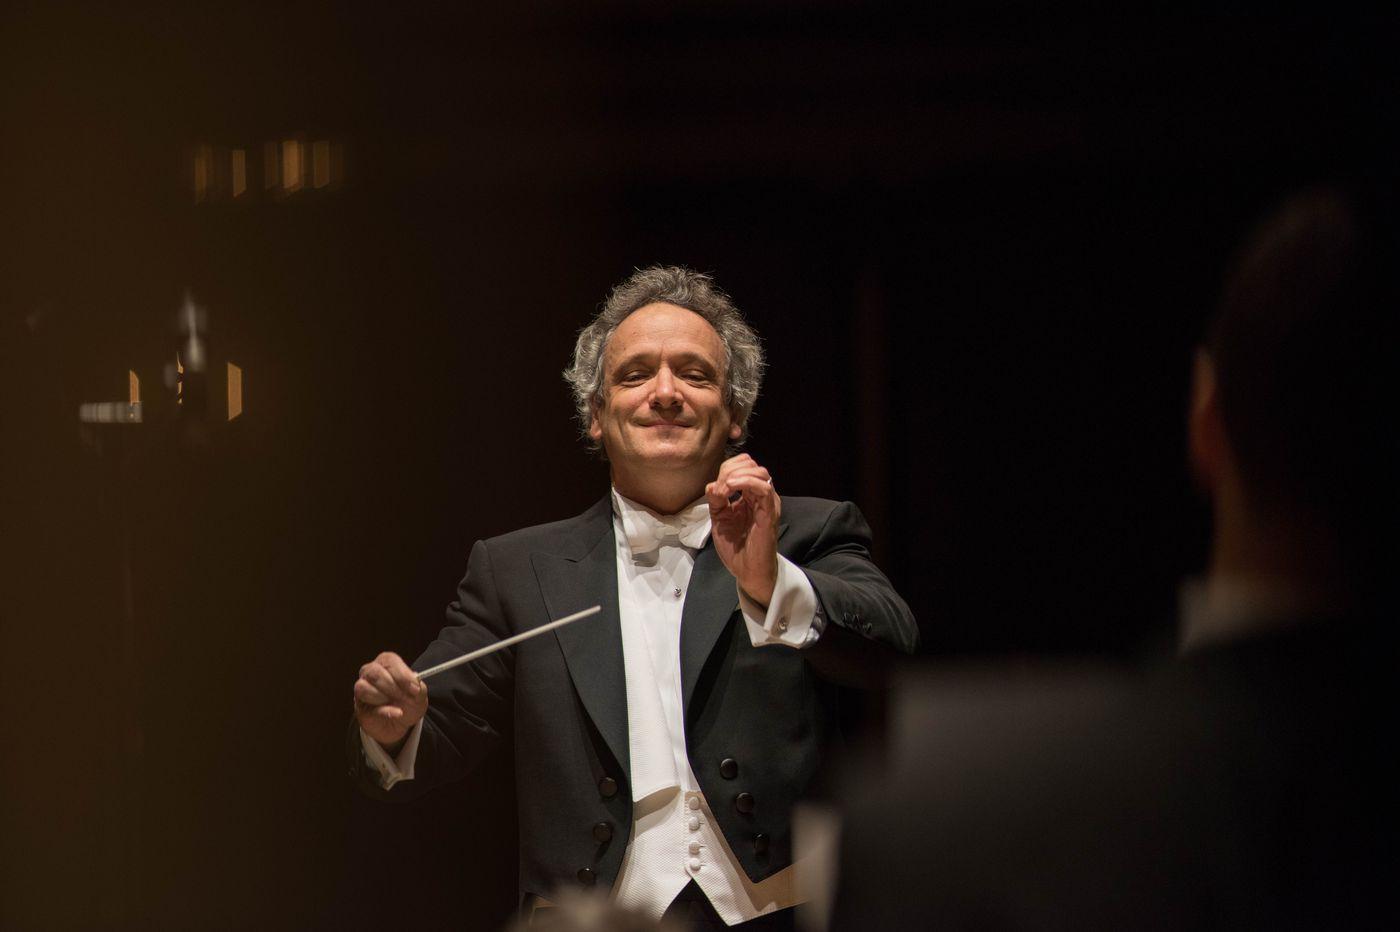 Cincinnati music director elevates the Philadelphia Orchestra's program